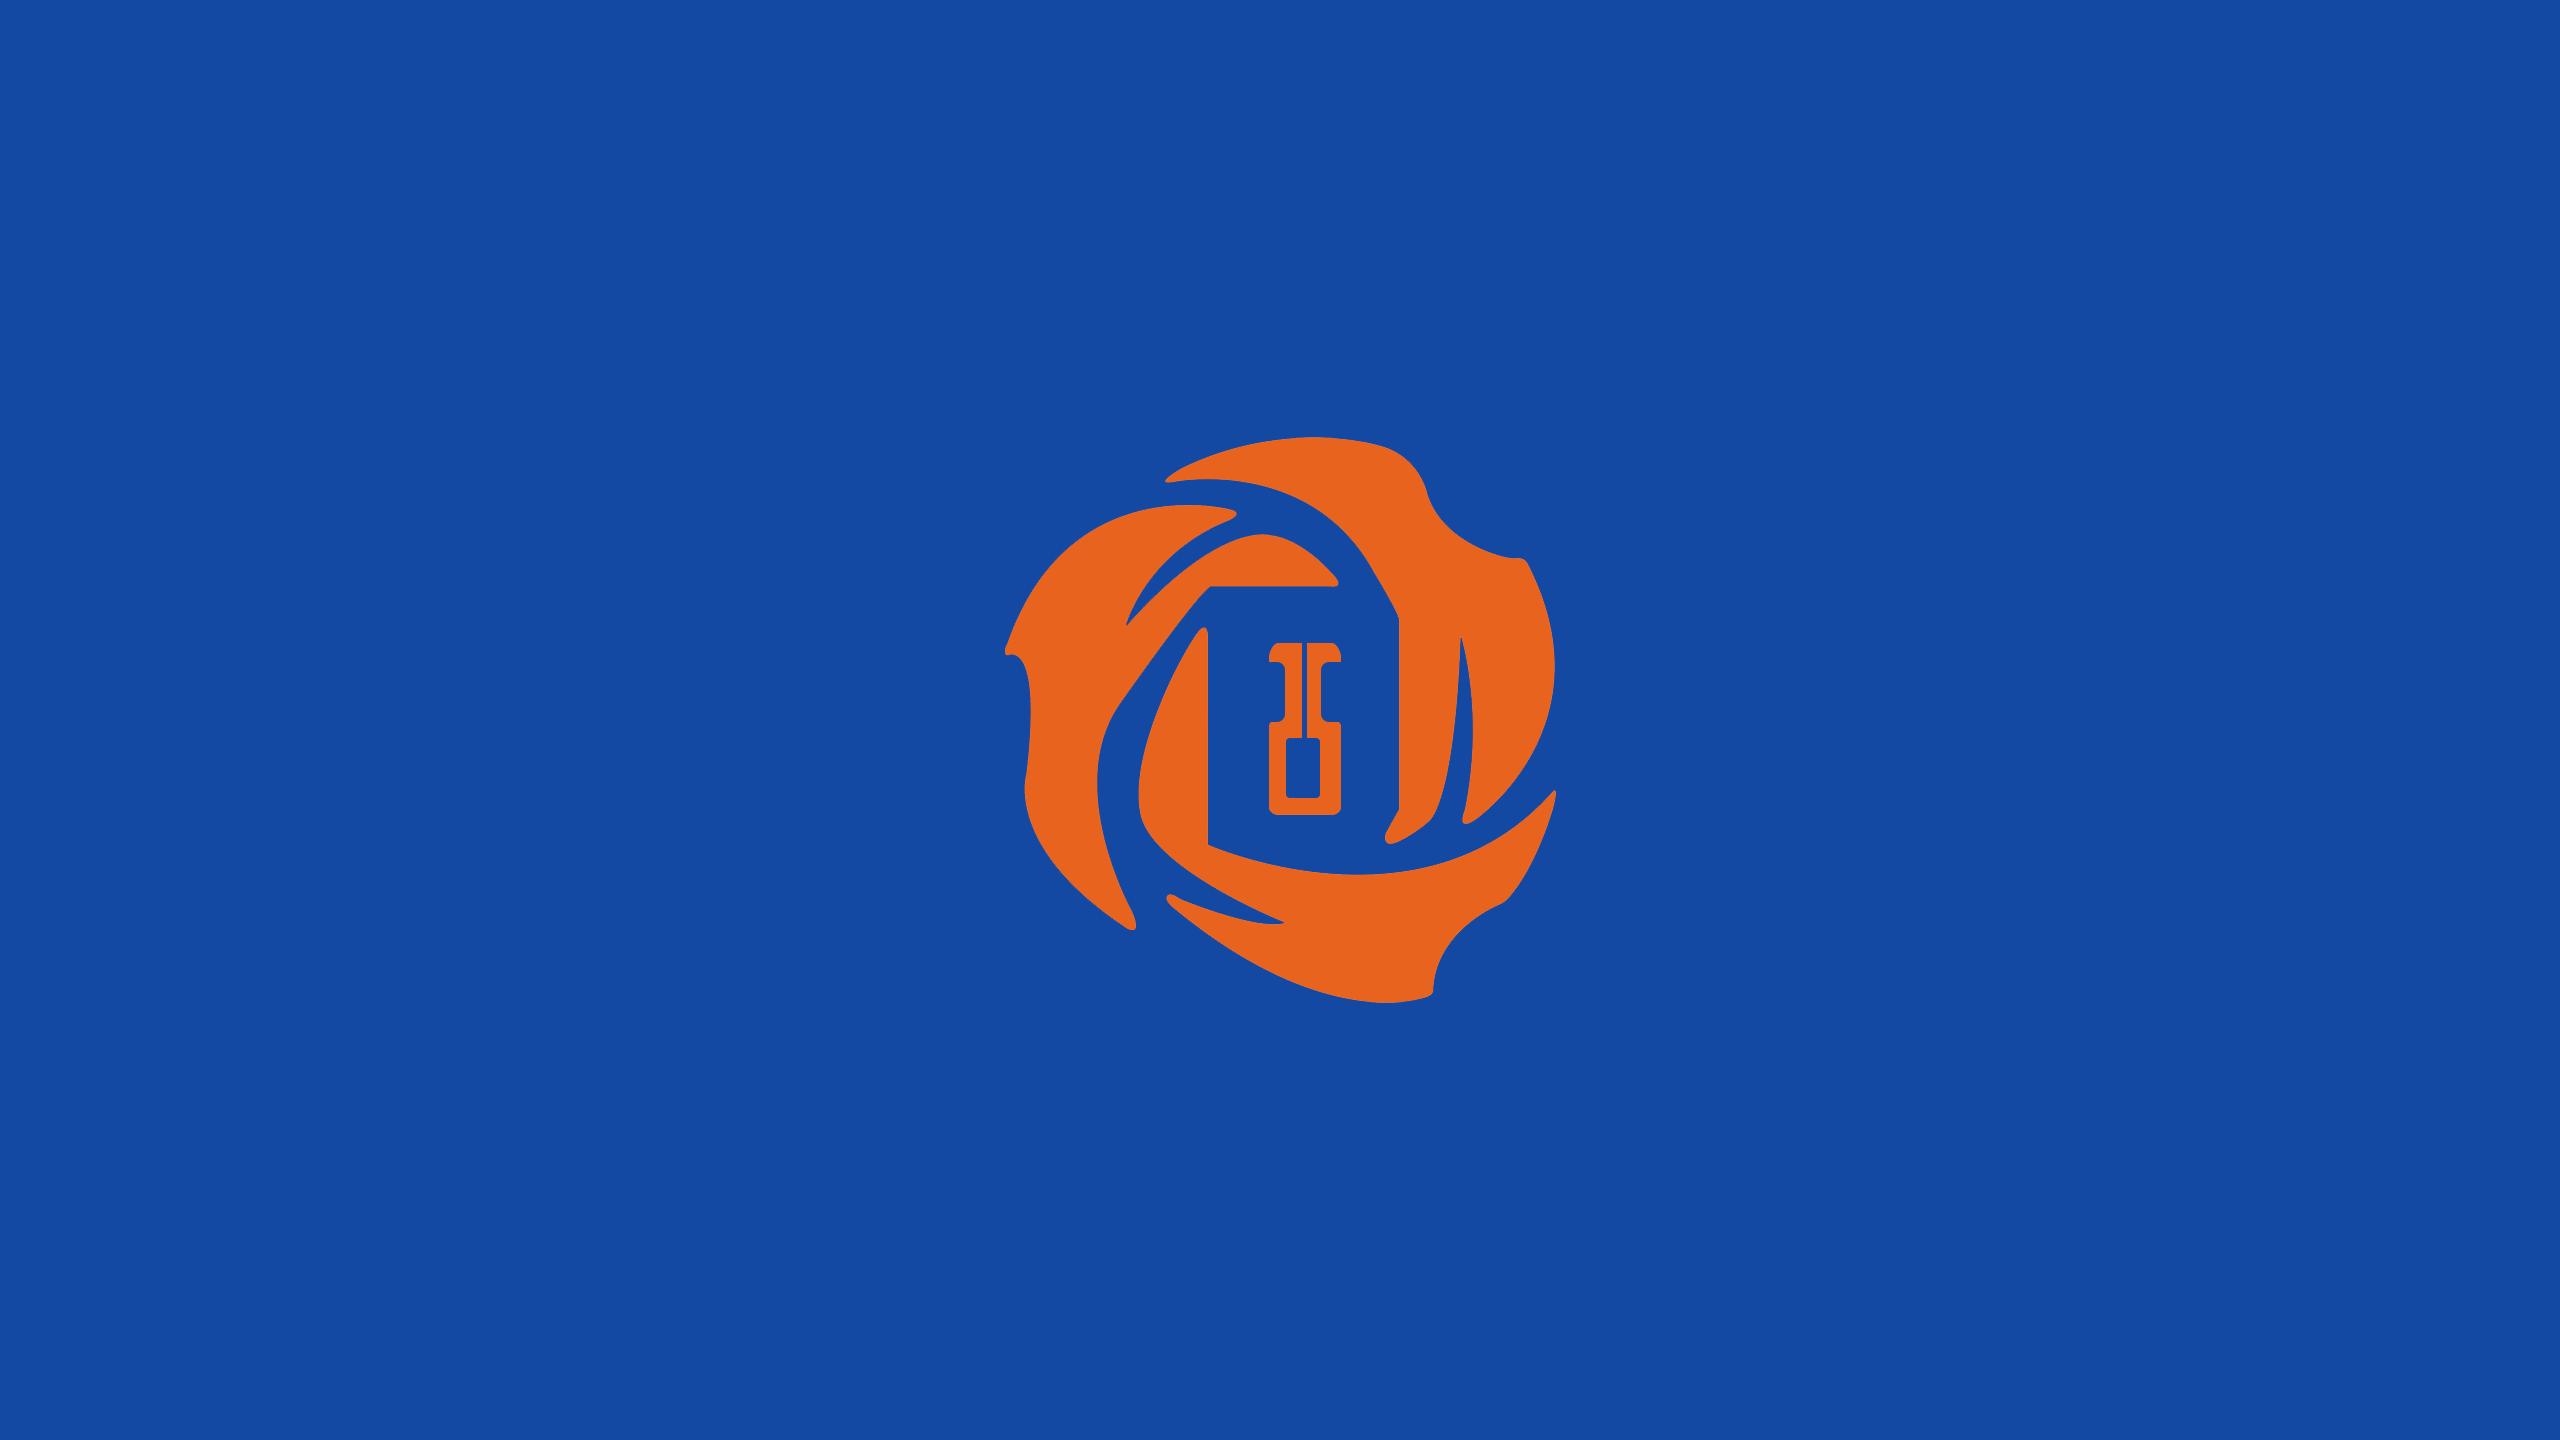 Derrick rose logo png » PNG Image.